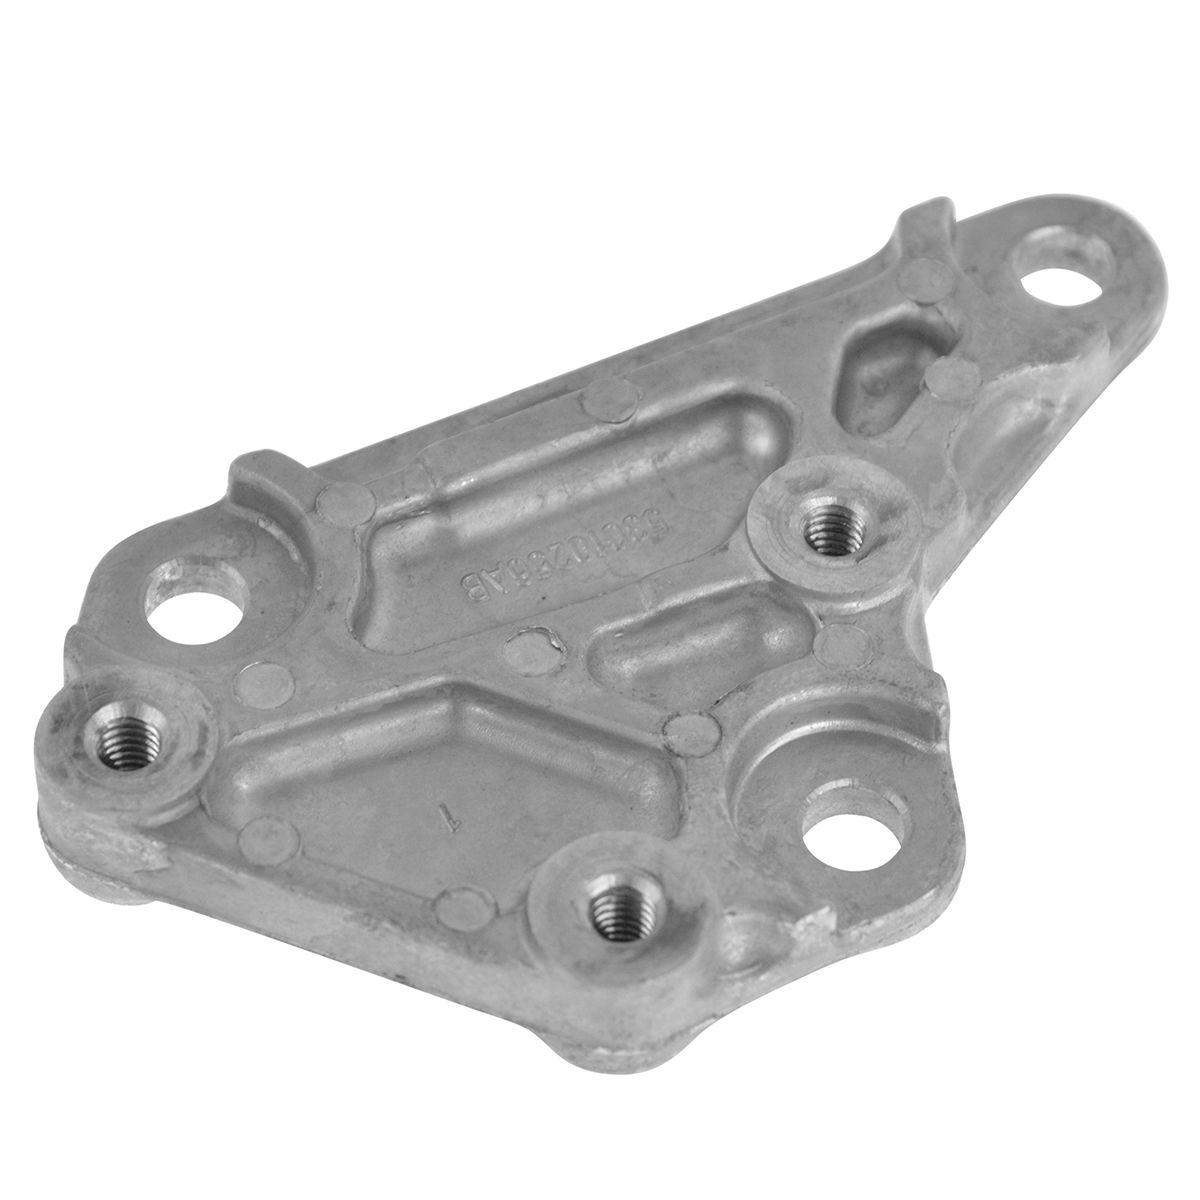 hight resolution of mopar oem power steering pump mounting bracket for 96 98 jeep grand cherokee new